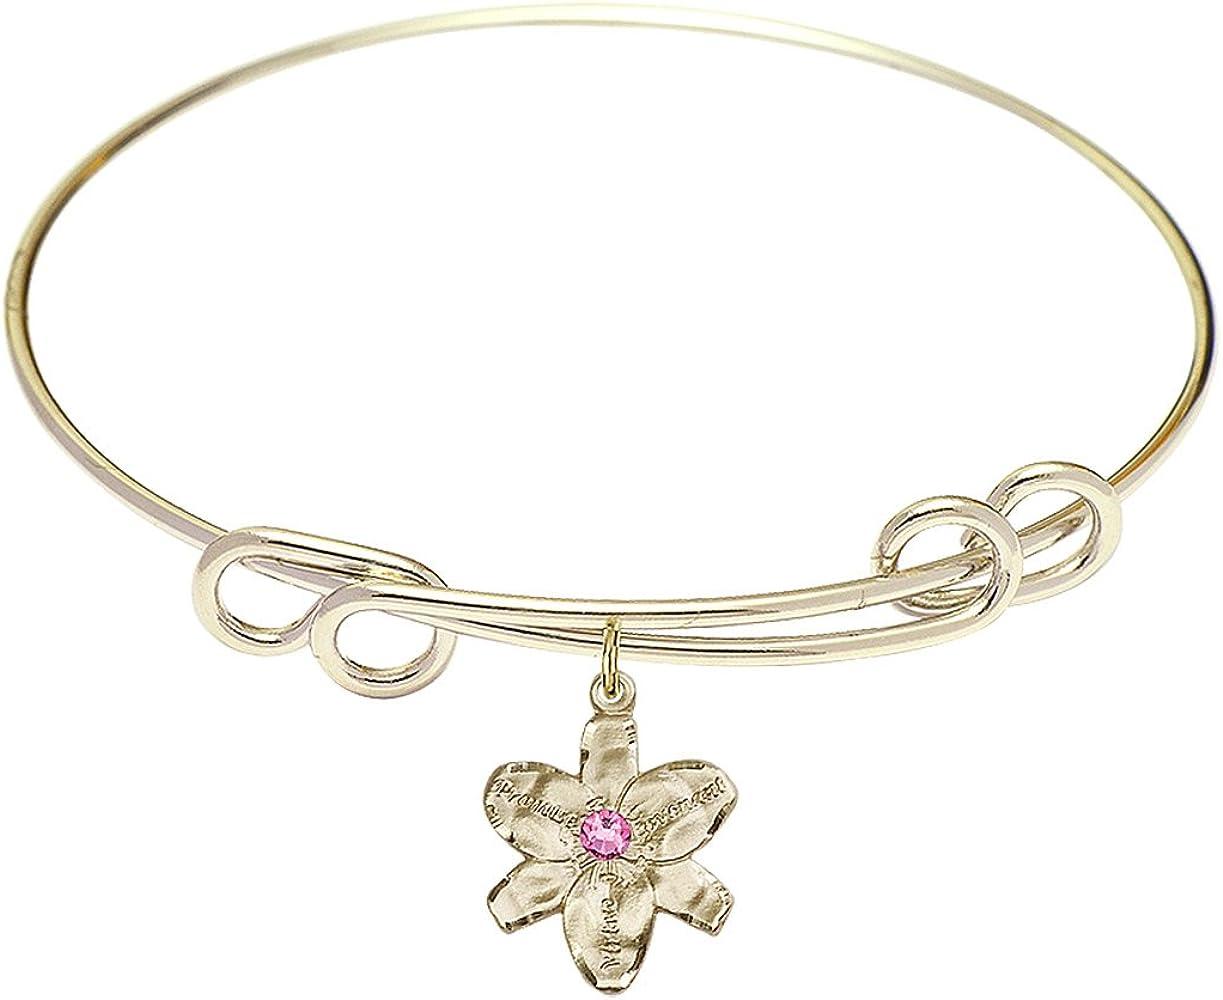 DiamondJewelryNY Double Loop Bangle Bracelet Same day shipping free a Cha with Chastity